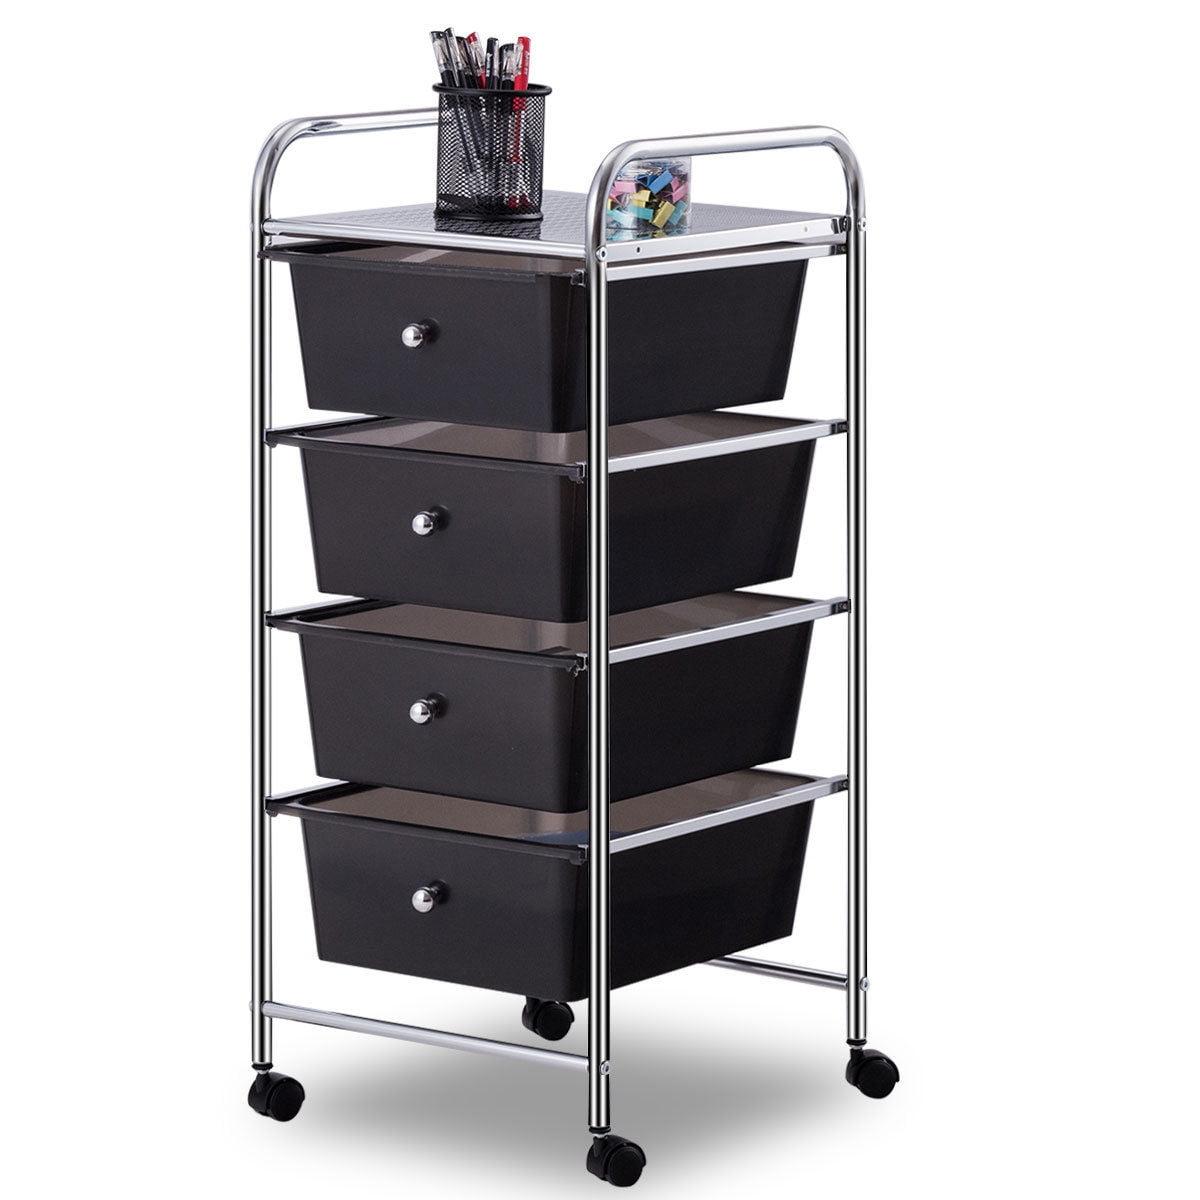 Costway 4 Drawers Metal Rolling Storage Cart Scrapbook Supply & Paper Home Office